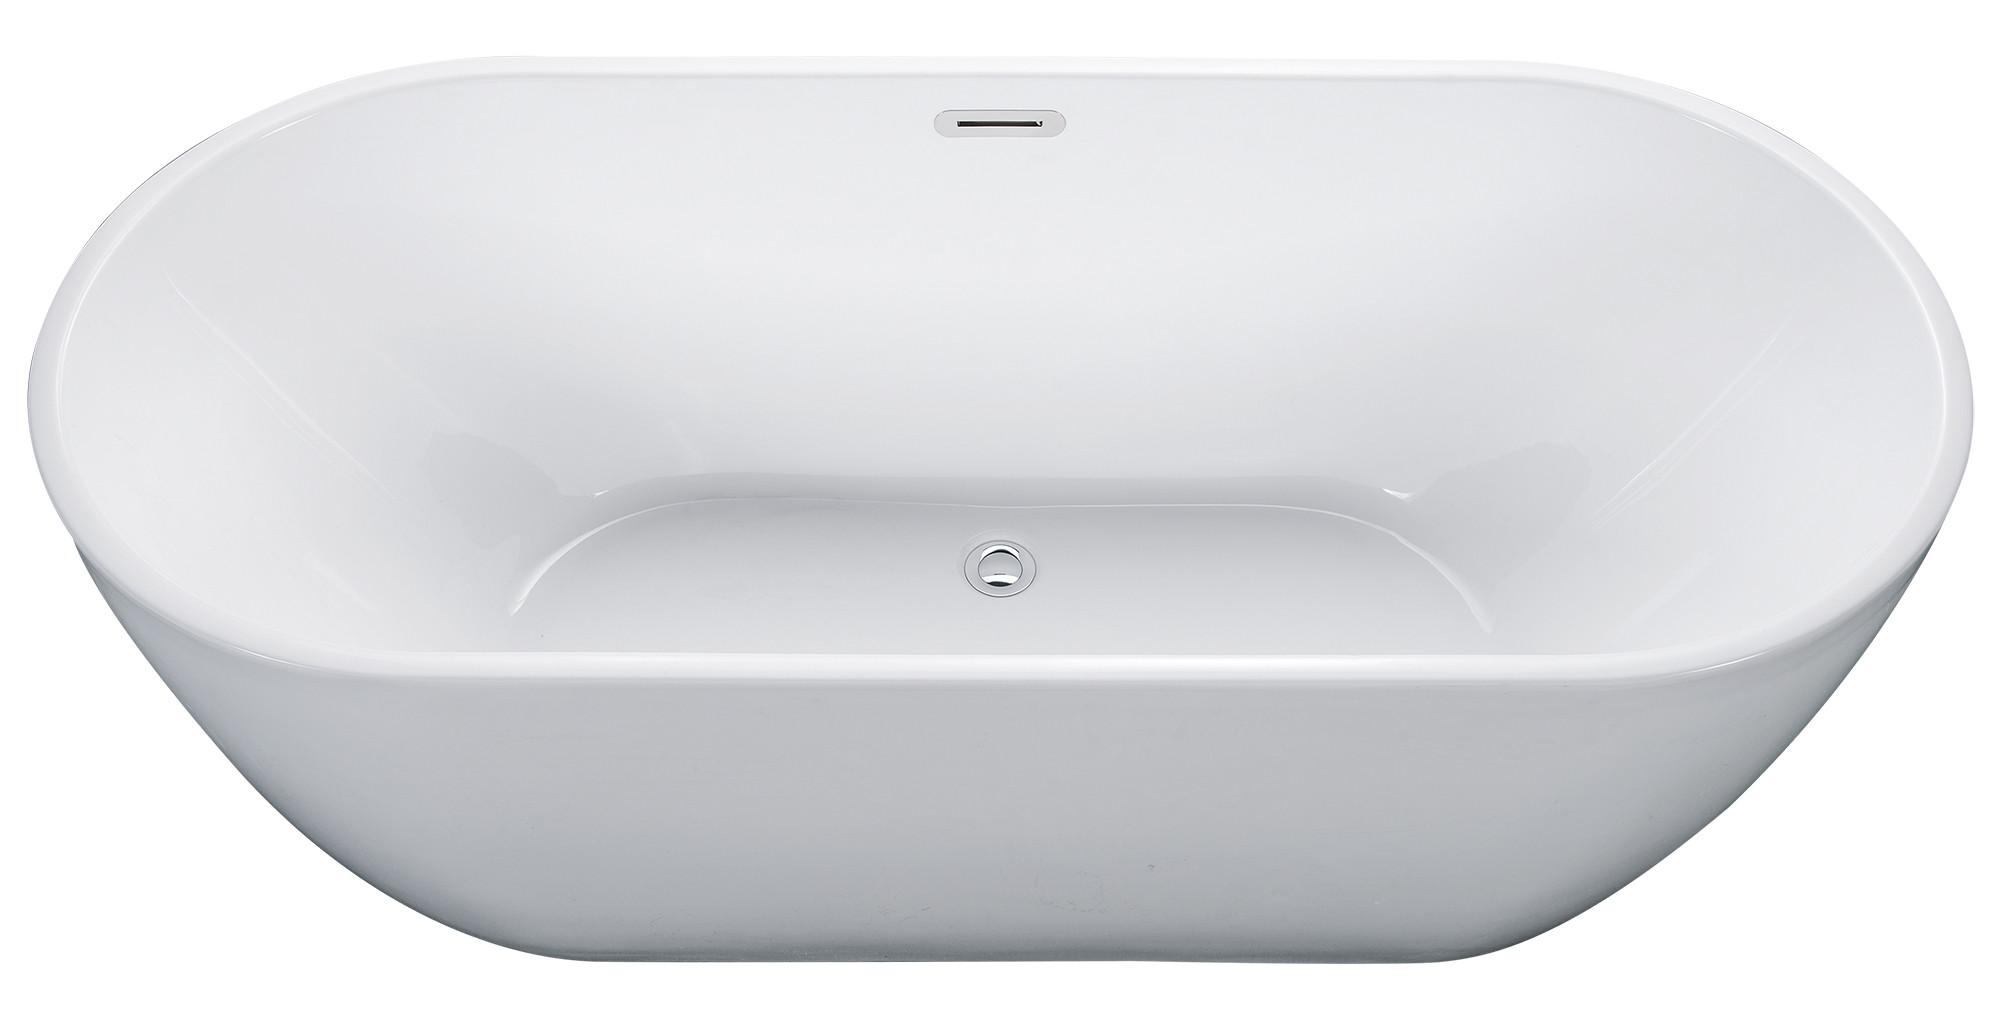 ALFI brand AB8839 67 Inch White Oval Acrylic Free Standing Soaking Bathtub